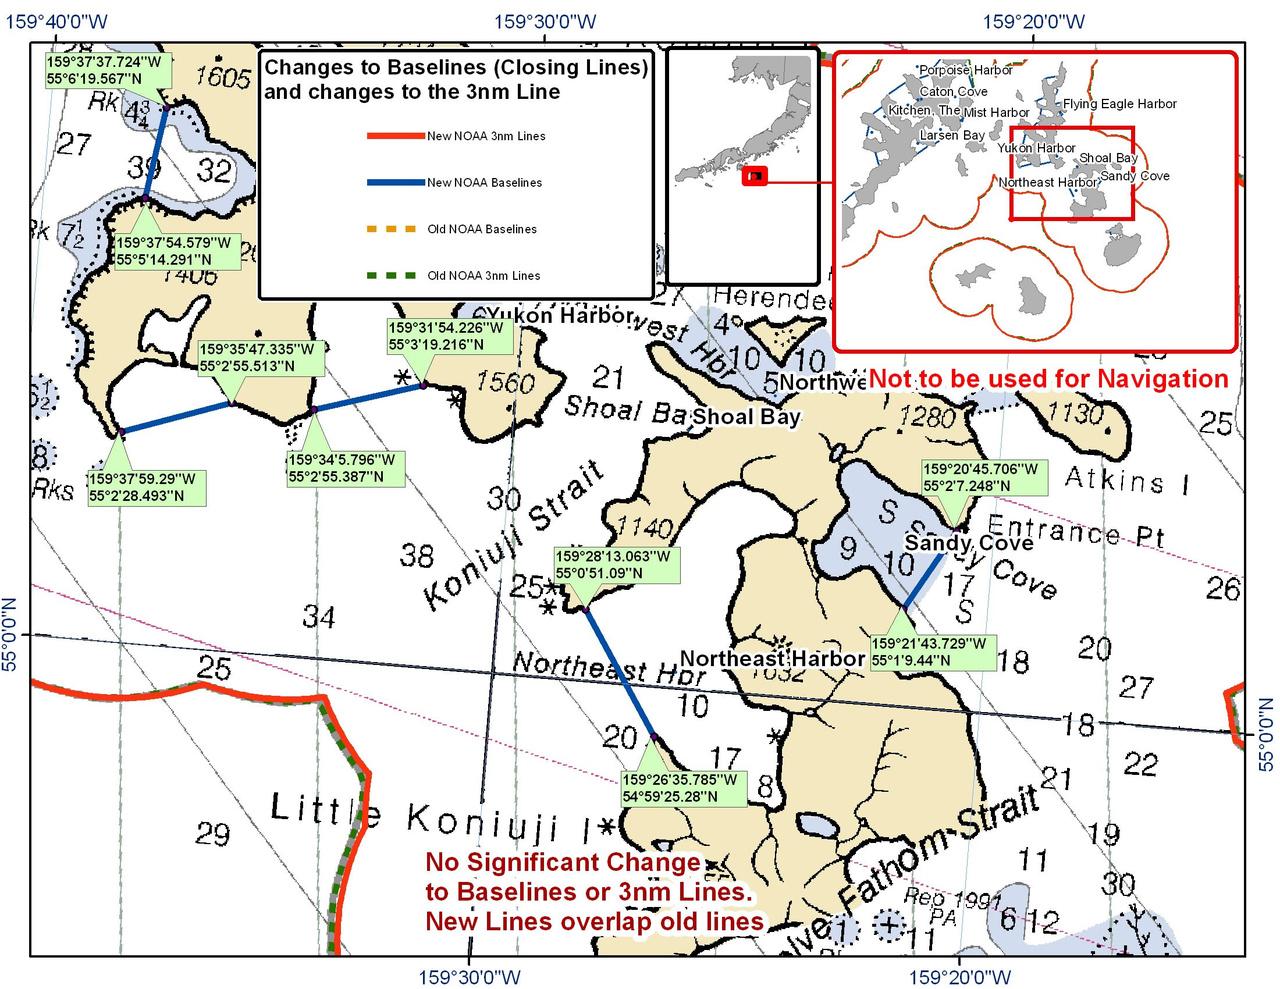 Chart for Koniuji Strait